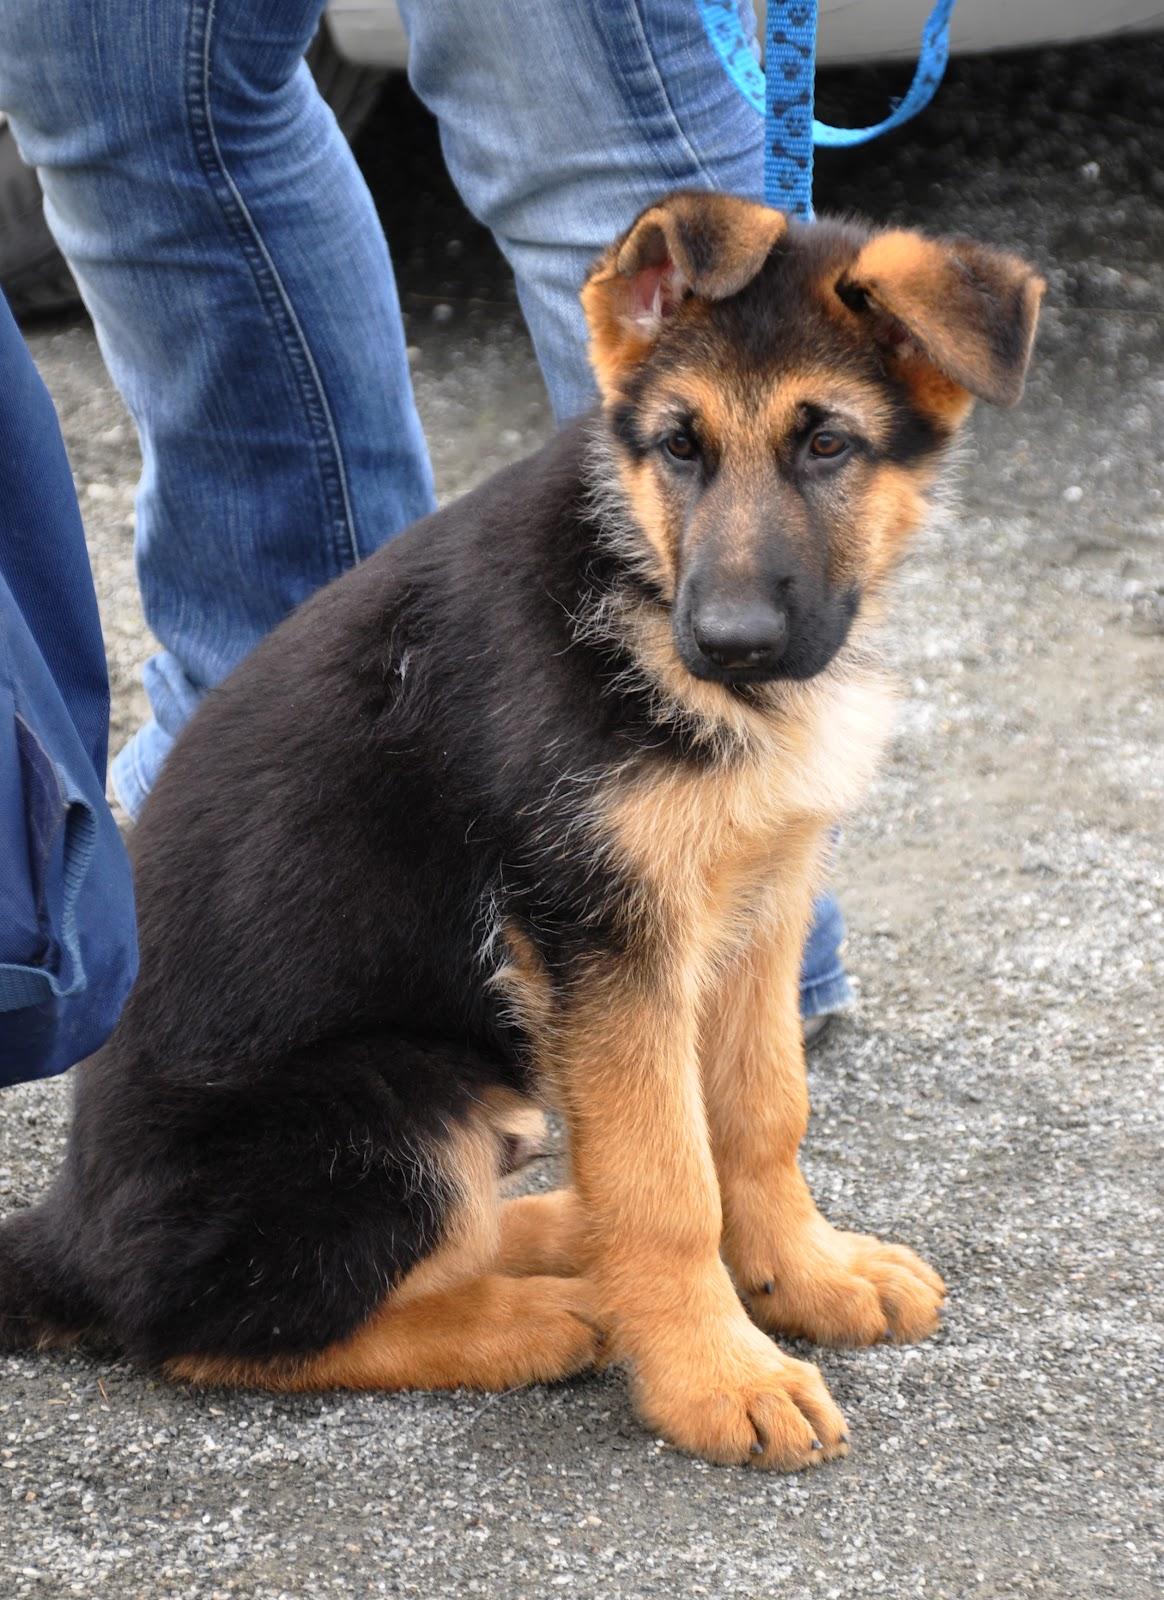 german shepherd mix puppies for sale lancaster puppies - HD1024×1407